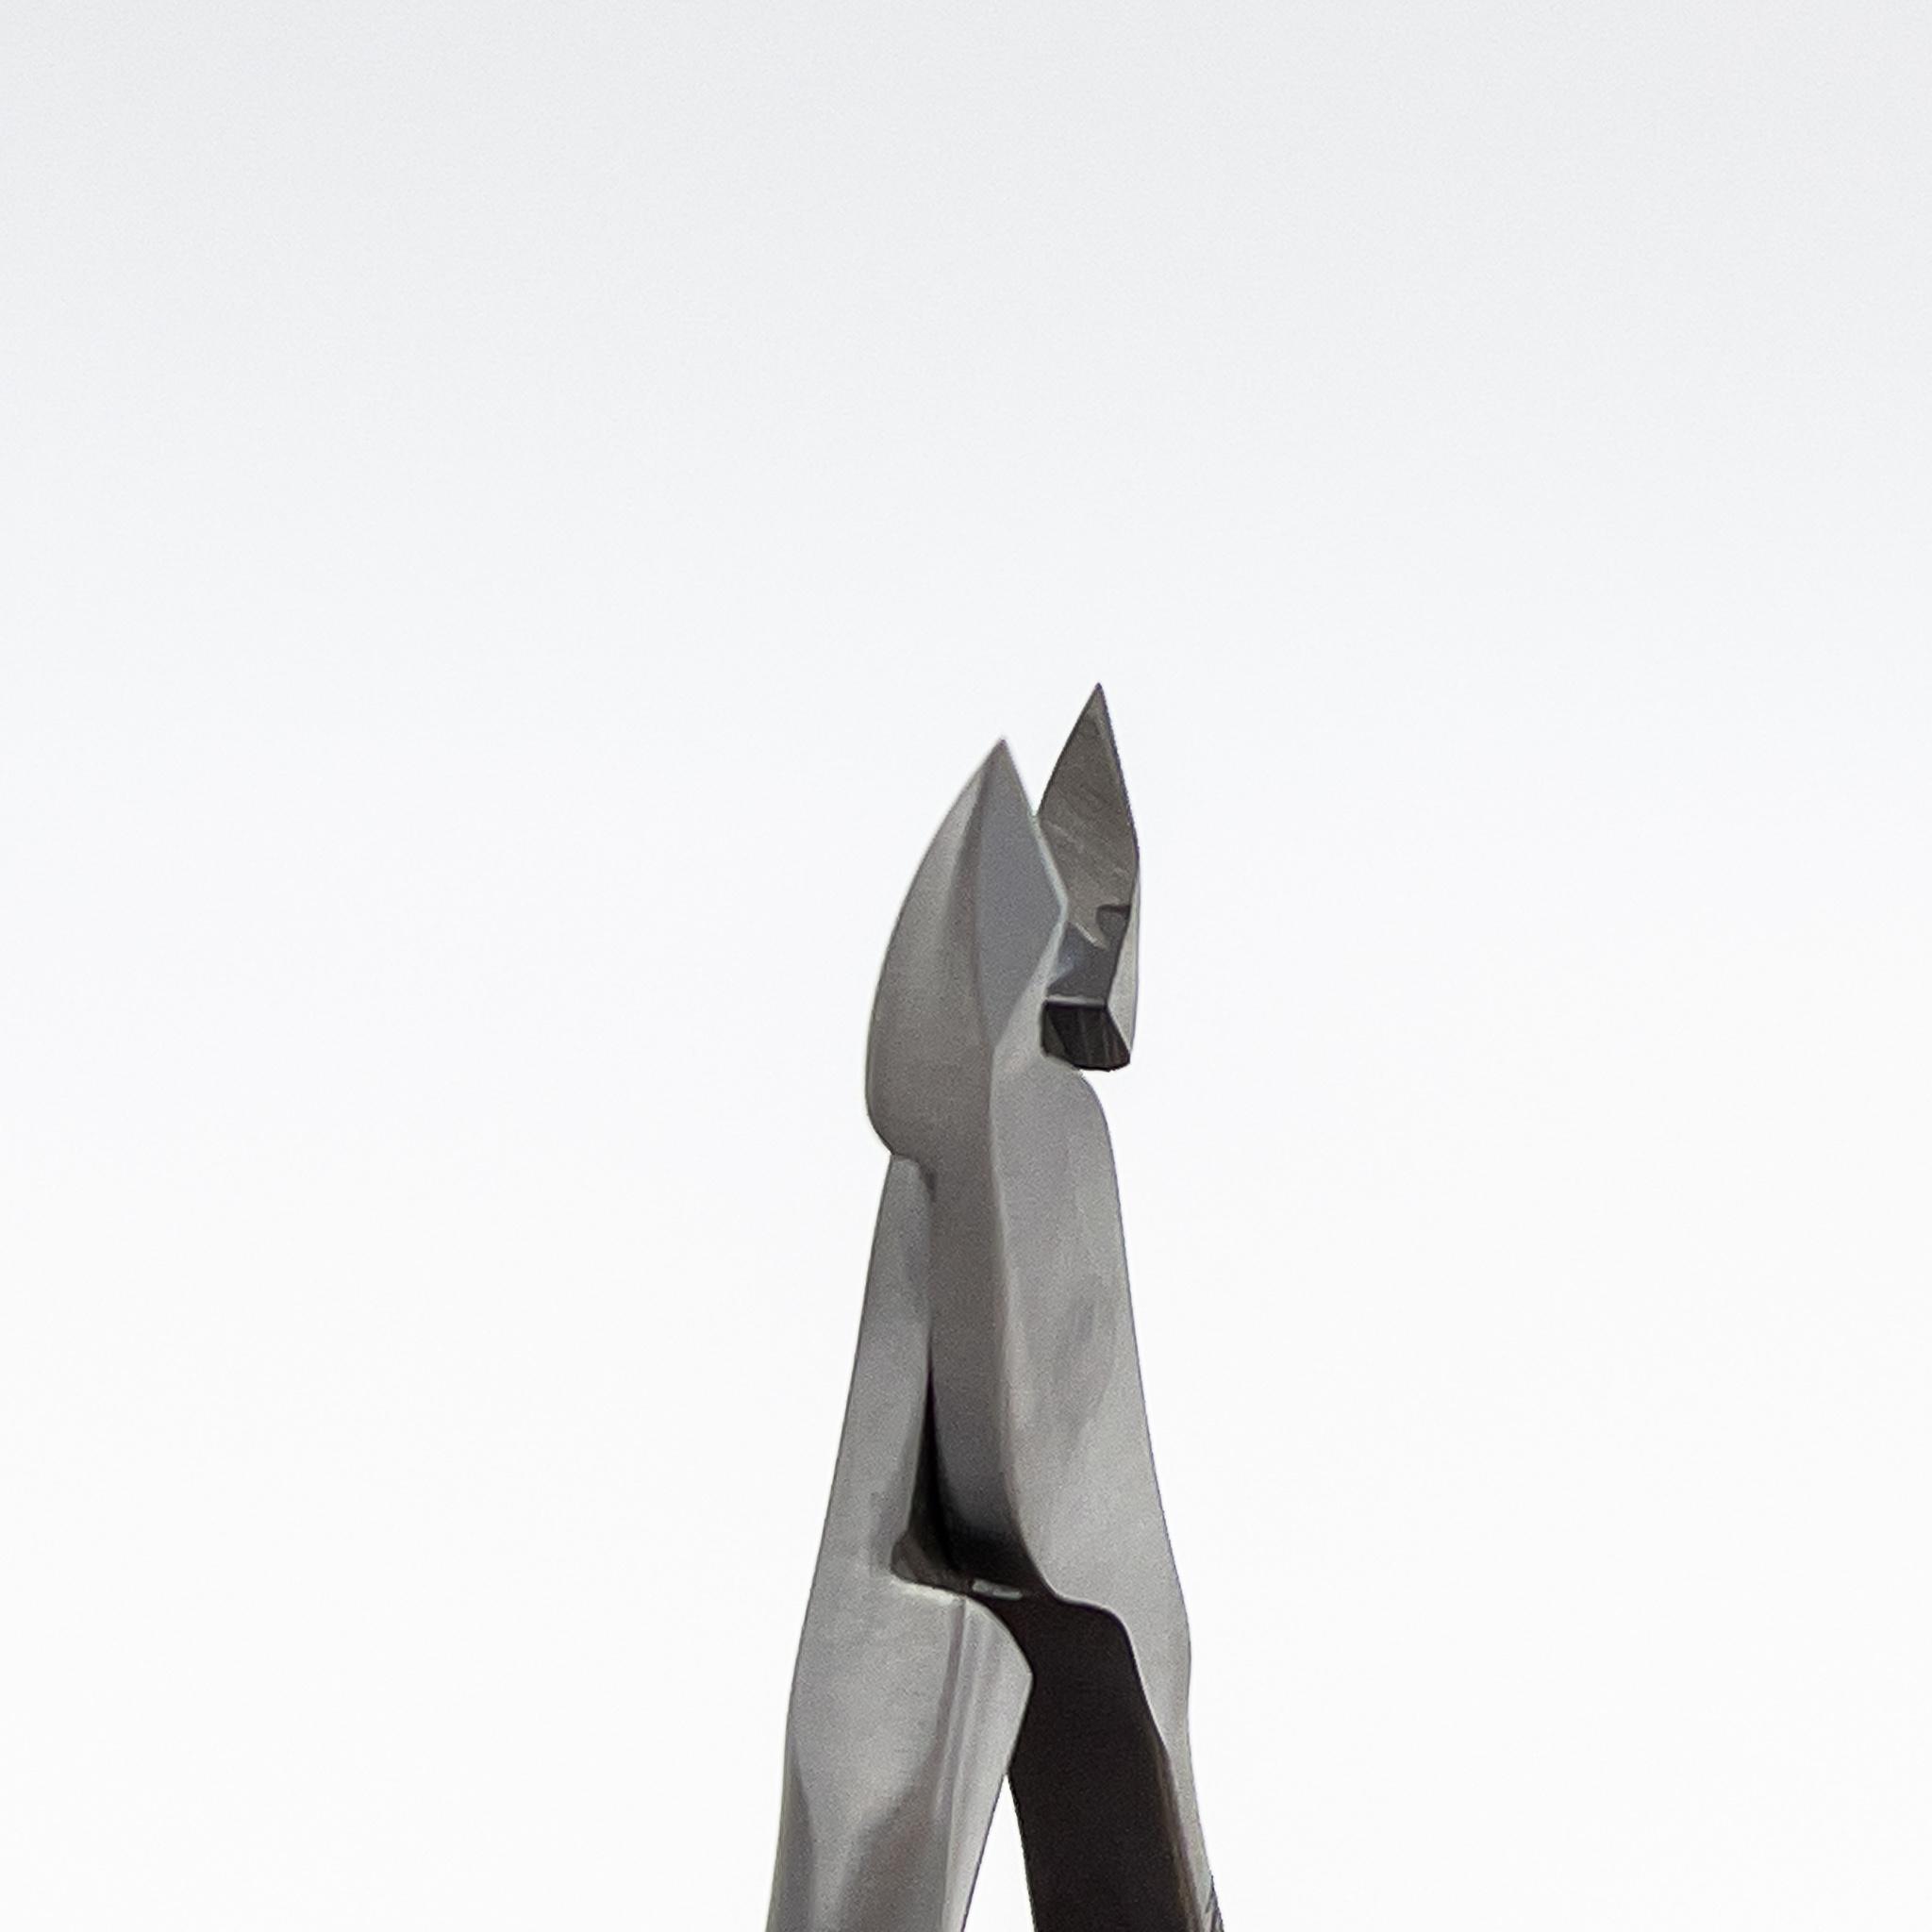 STALENA Vellentang 5 mm - korte handgreep KM-005 (N3-10-05)